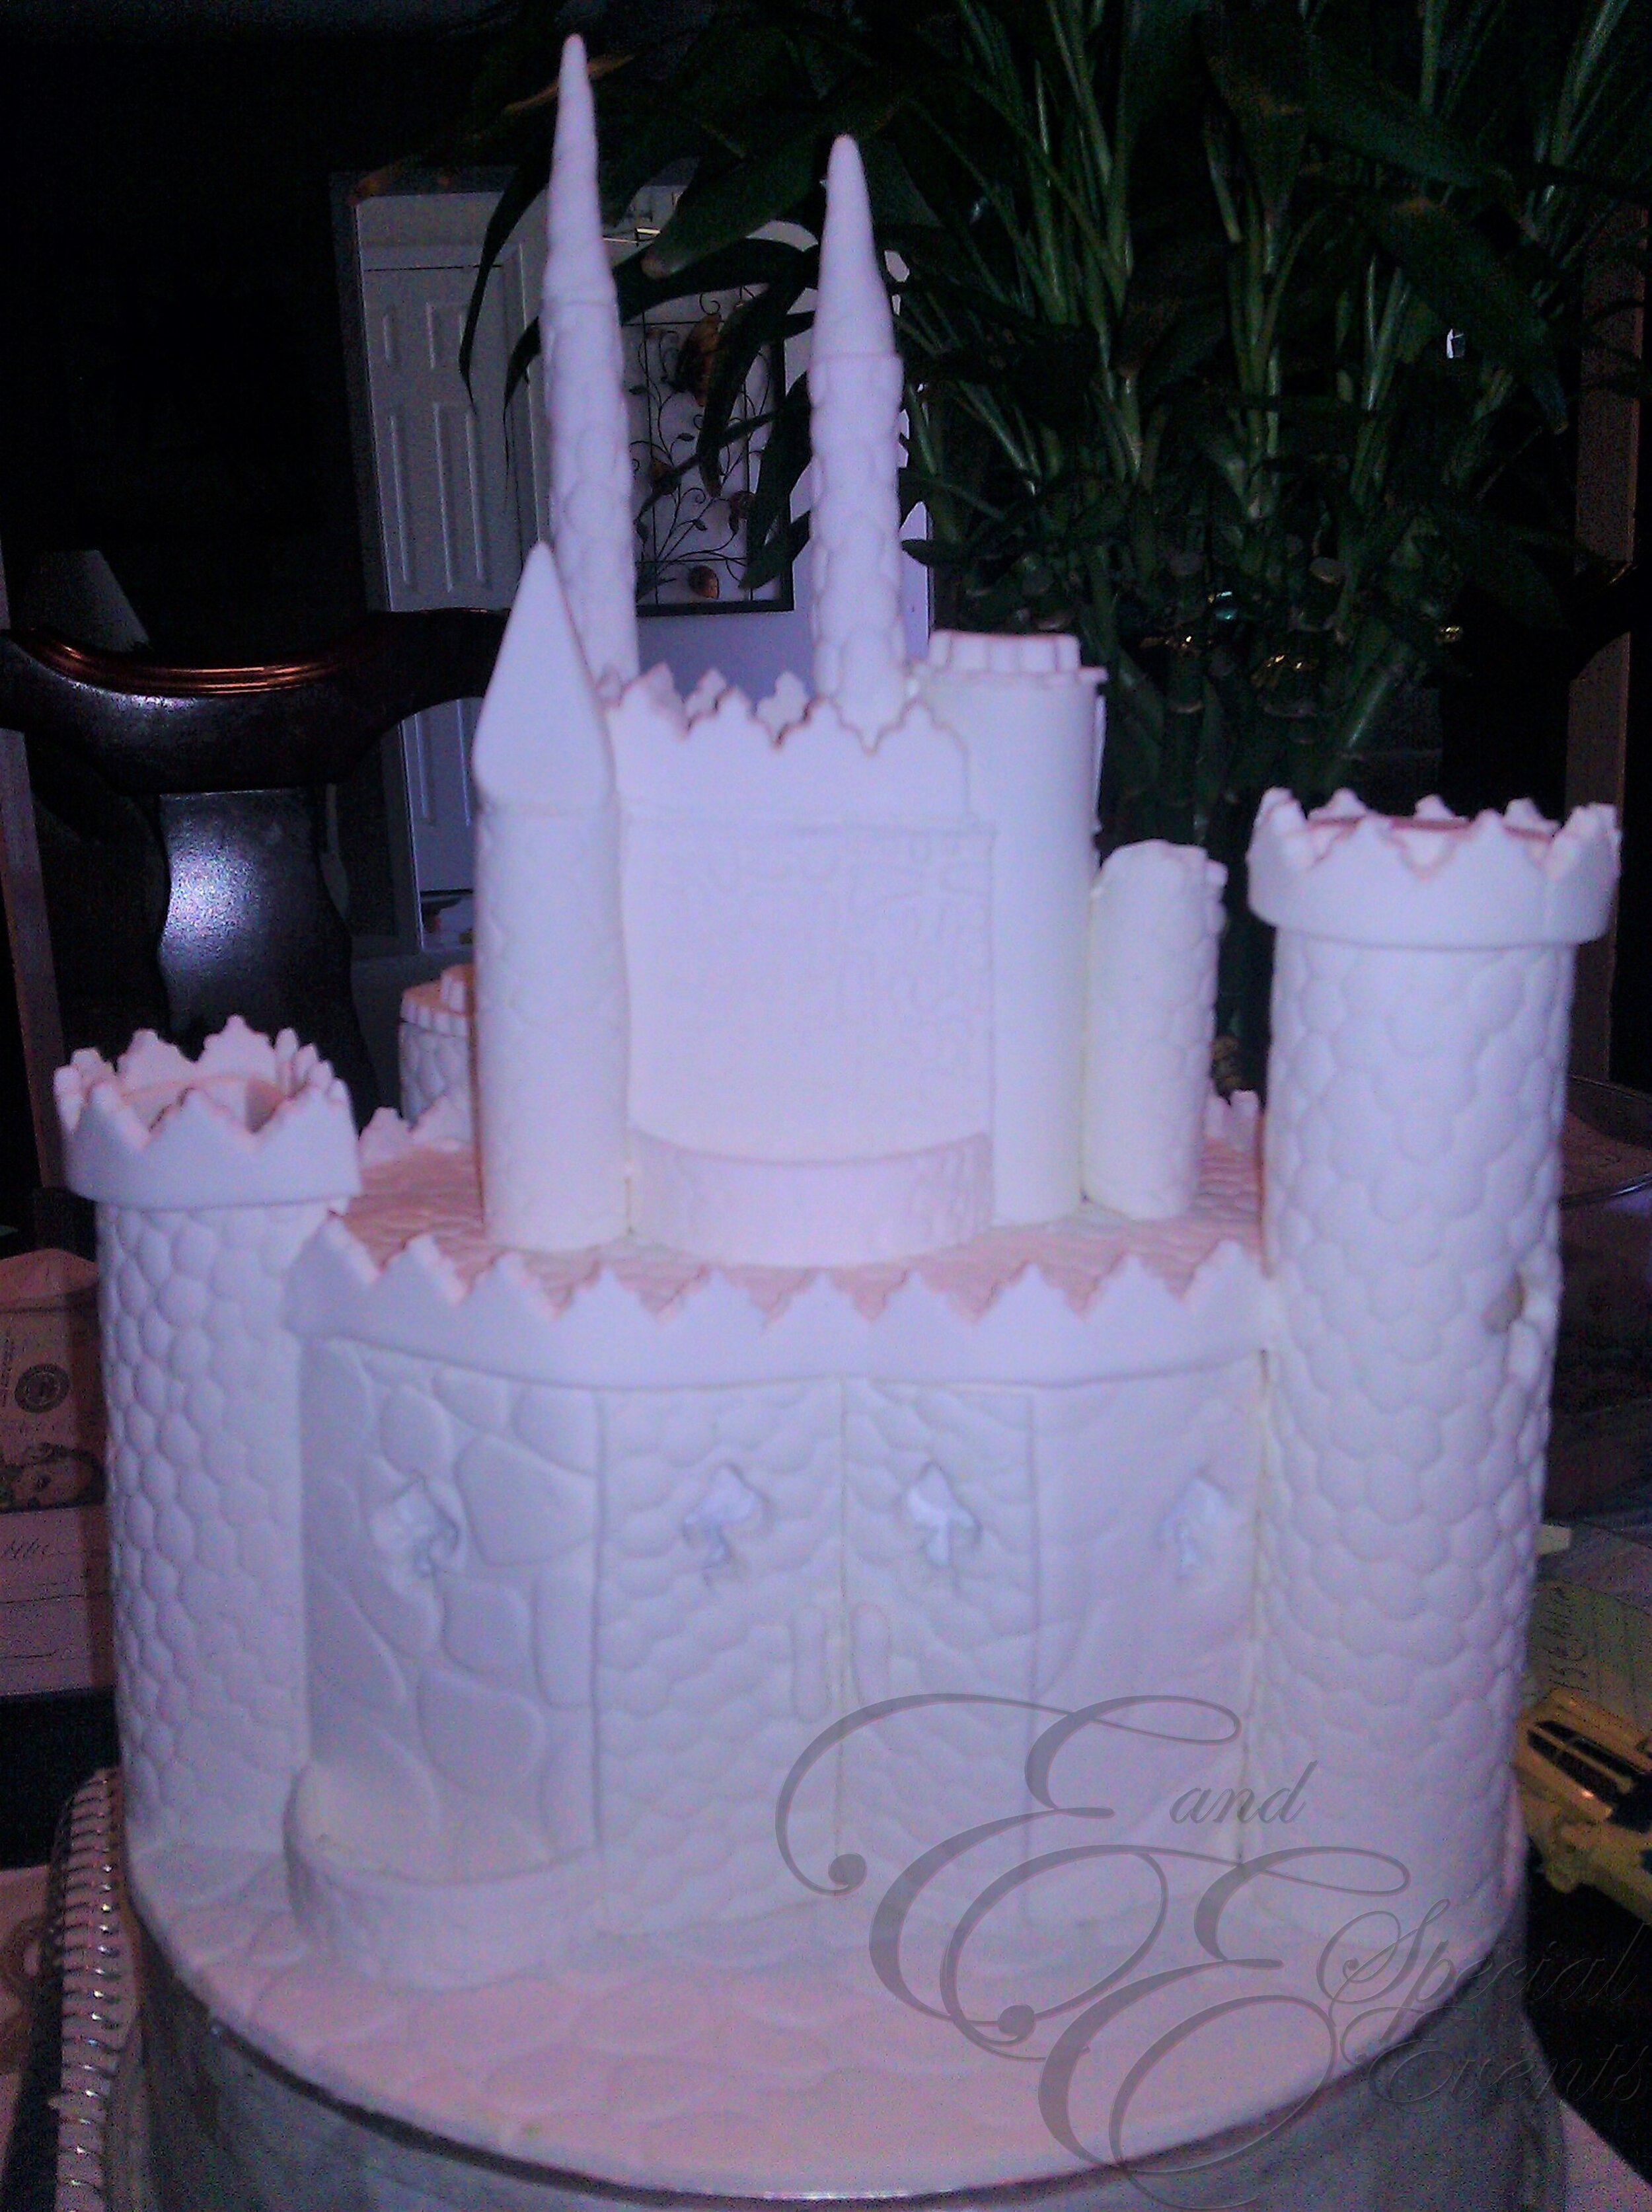 E_E_Special_Events_Specialty_Cakes_Birthday_Cakes_Virginia_Beach_Hampton_Roads19.jpg